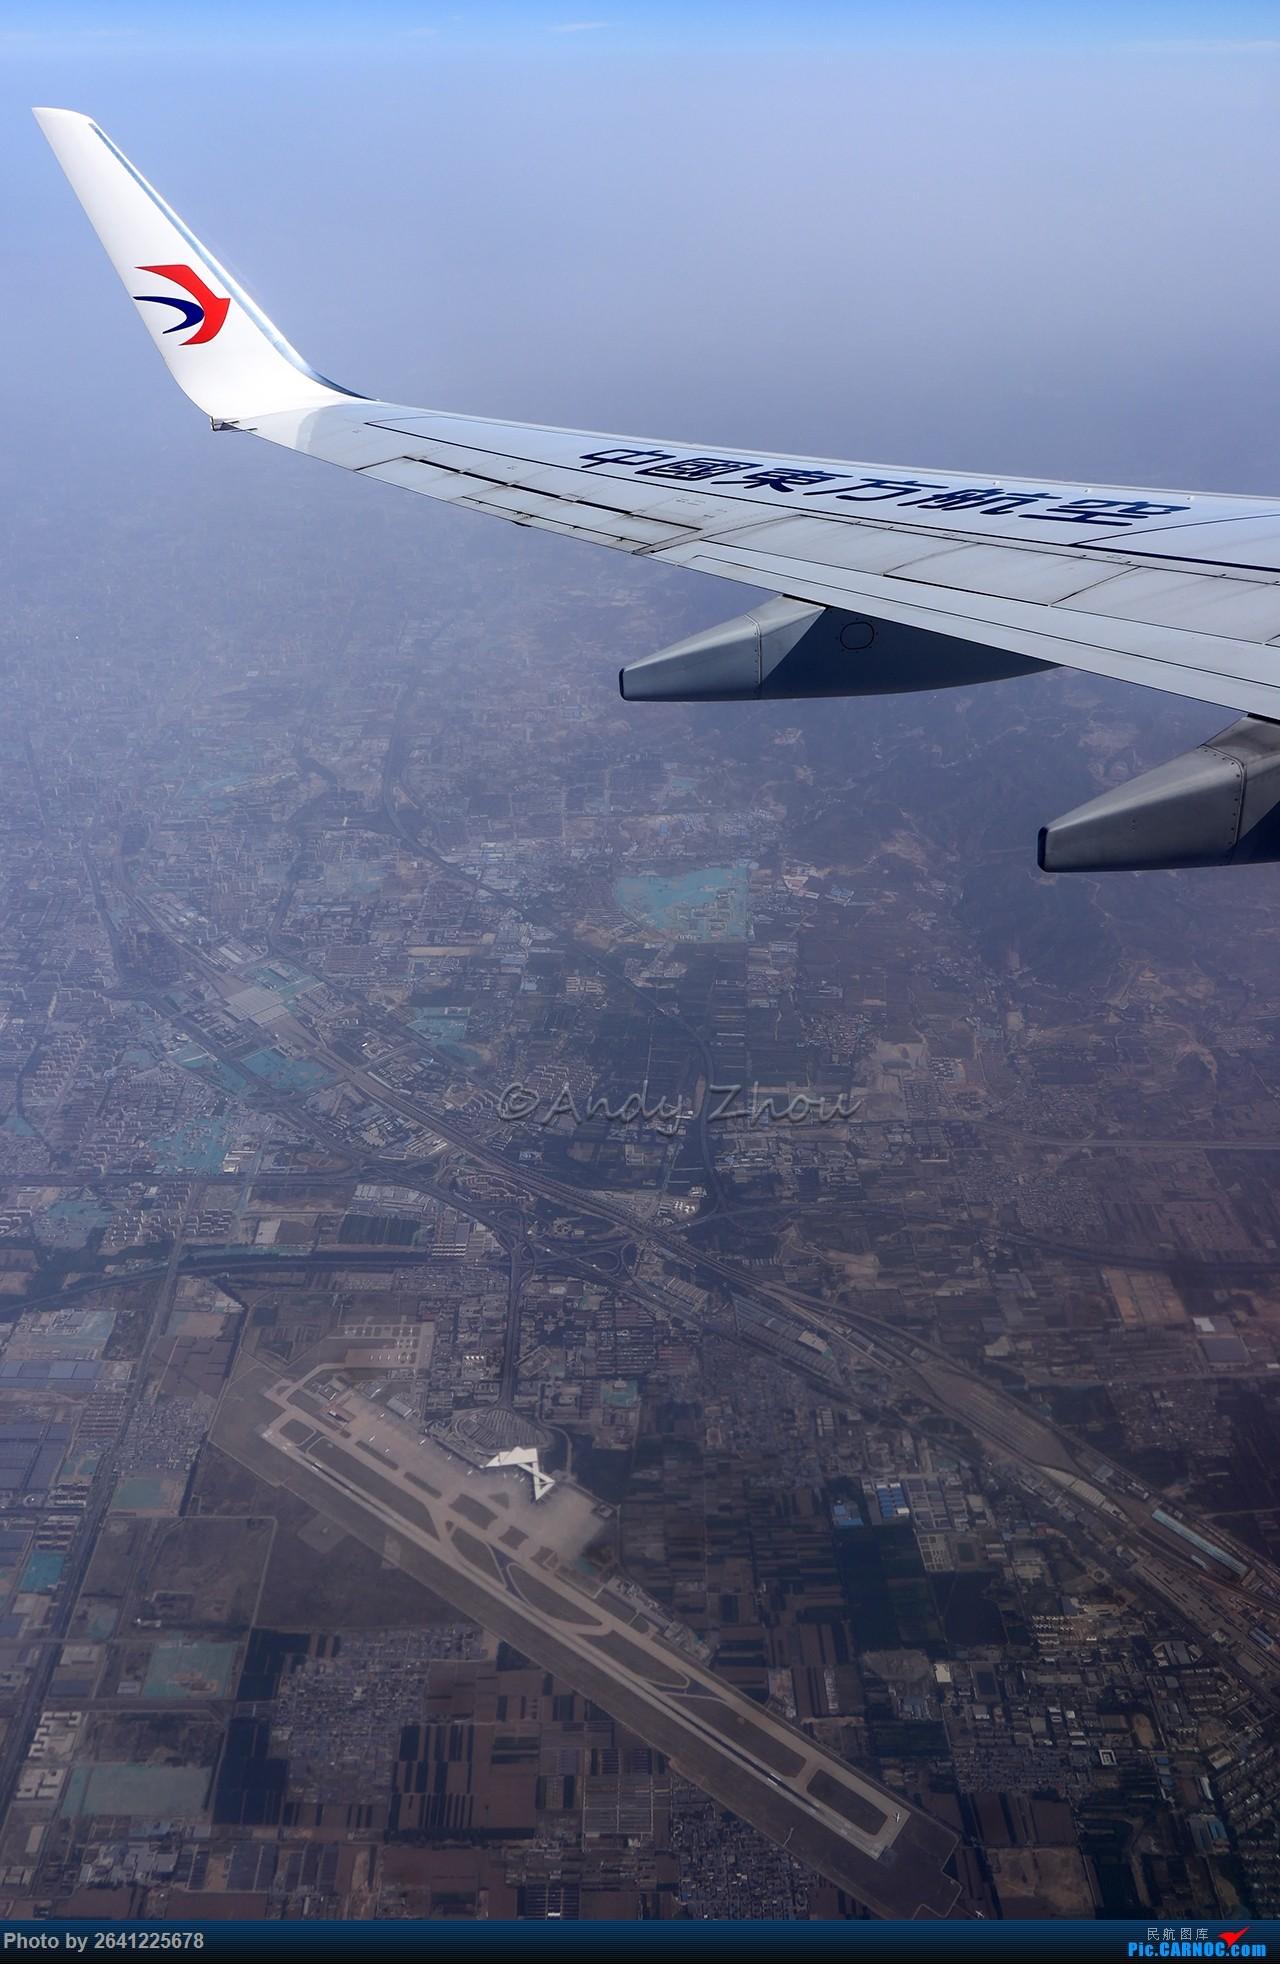 Re:[原创]【再来一组壁纸】MU2255/2256+六一之吕梁 BOEING 737-800 B-1253 中国太原武宿国际机场